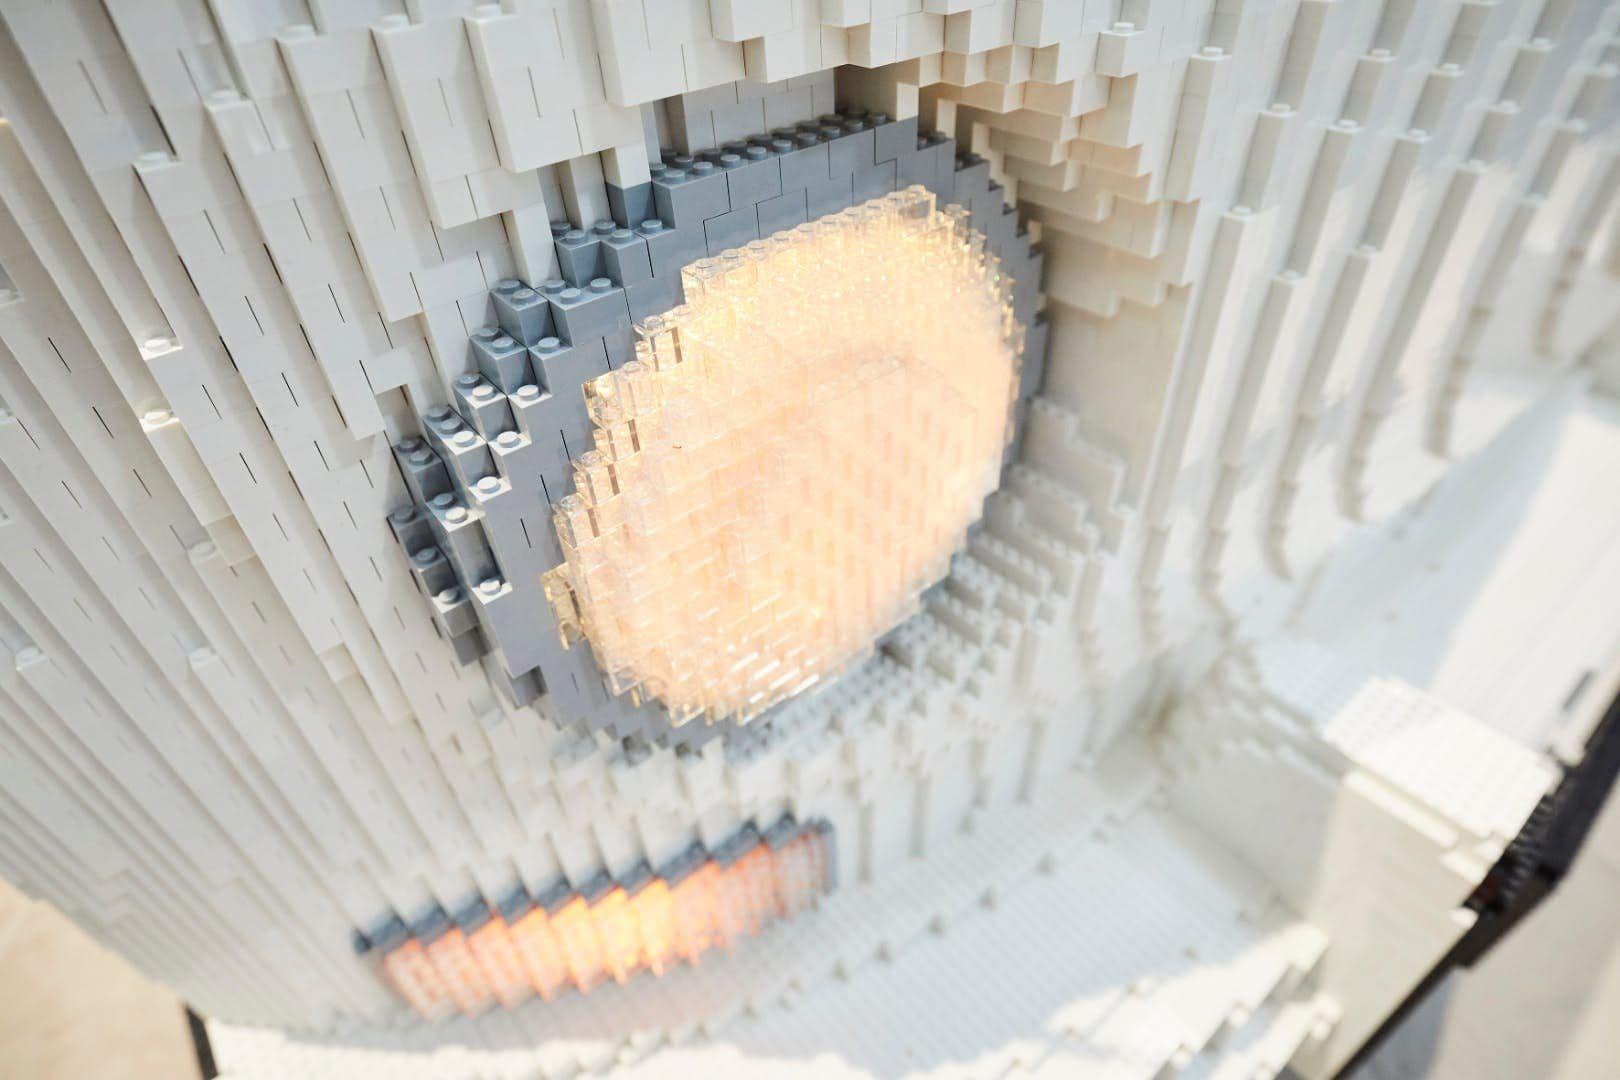 Lego Camper Van Design